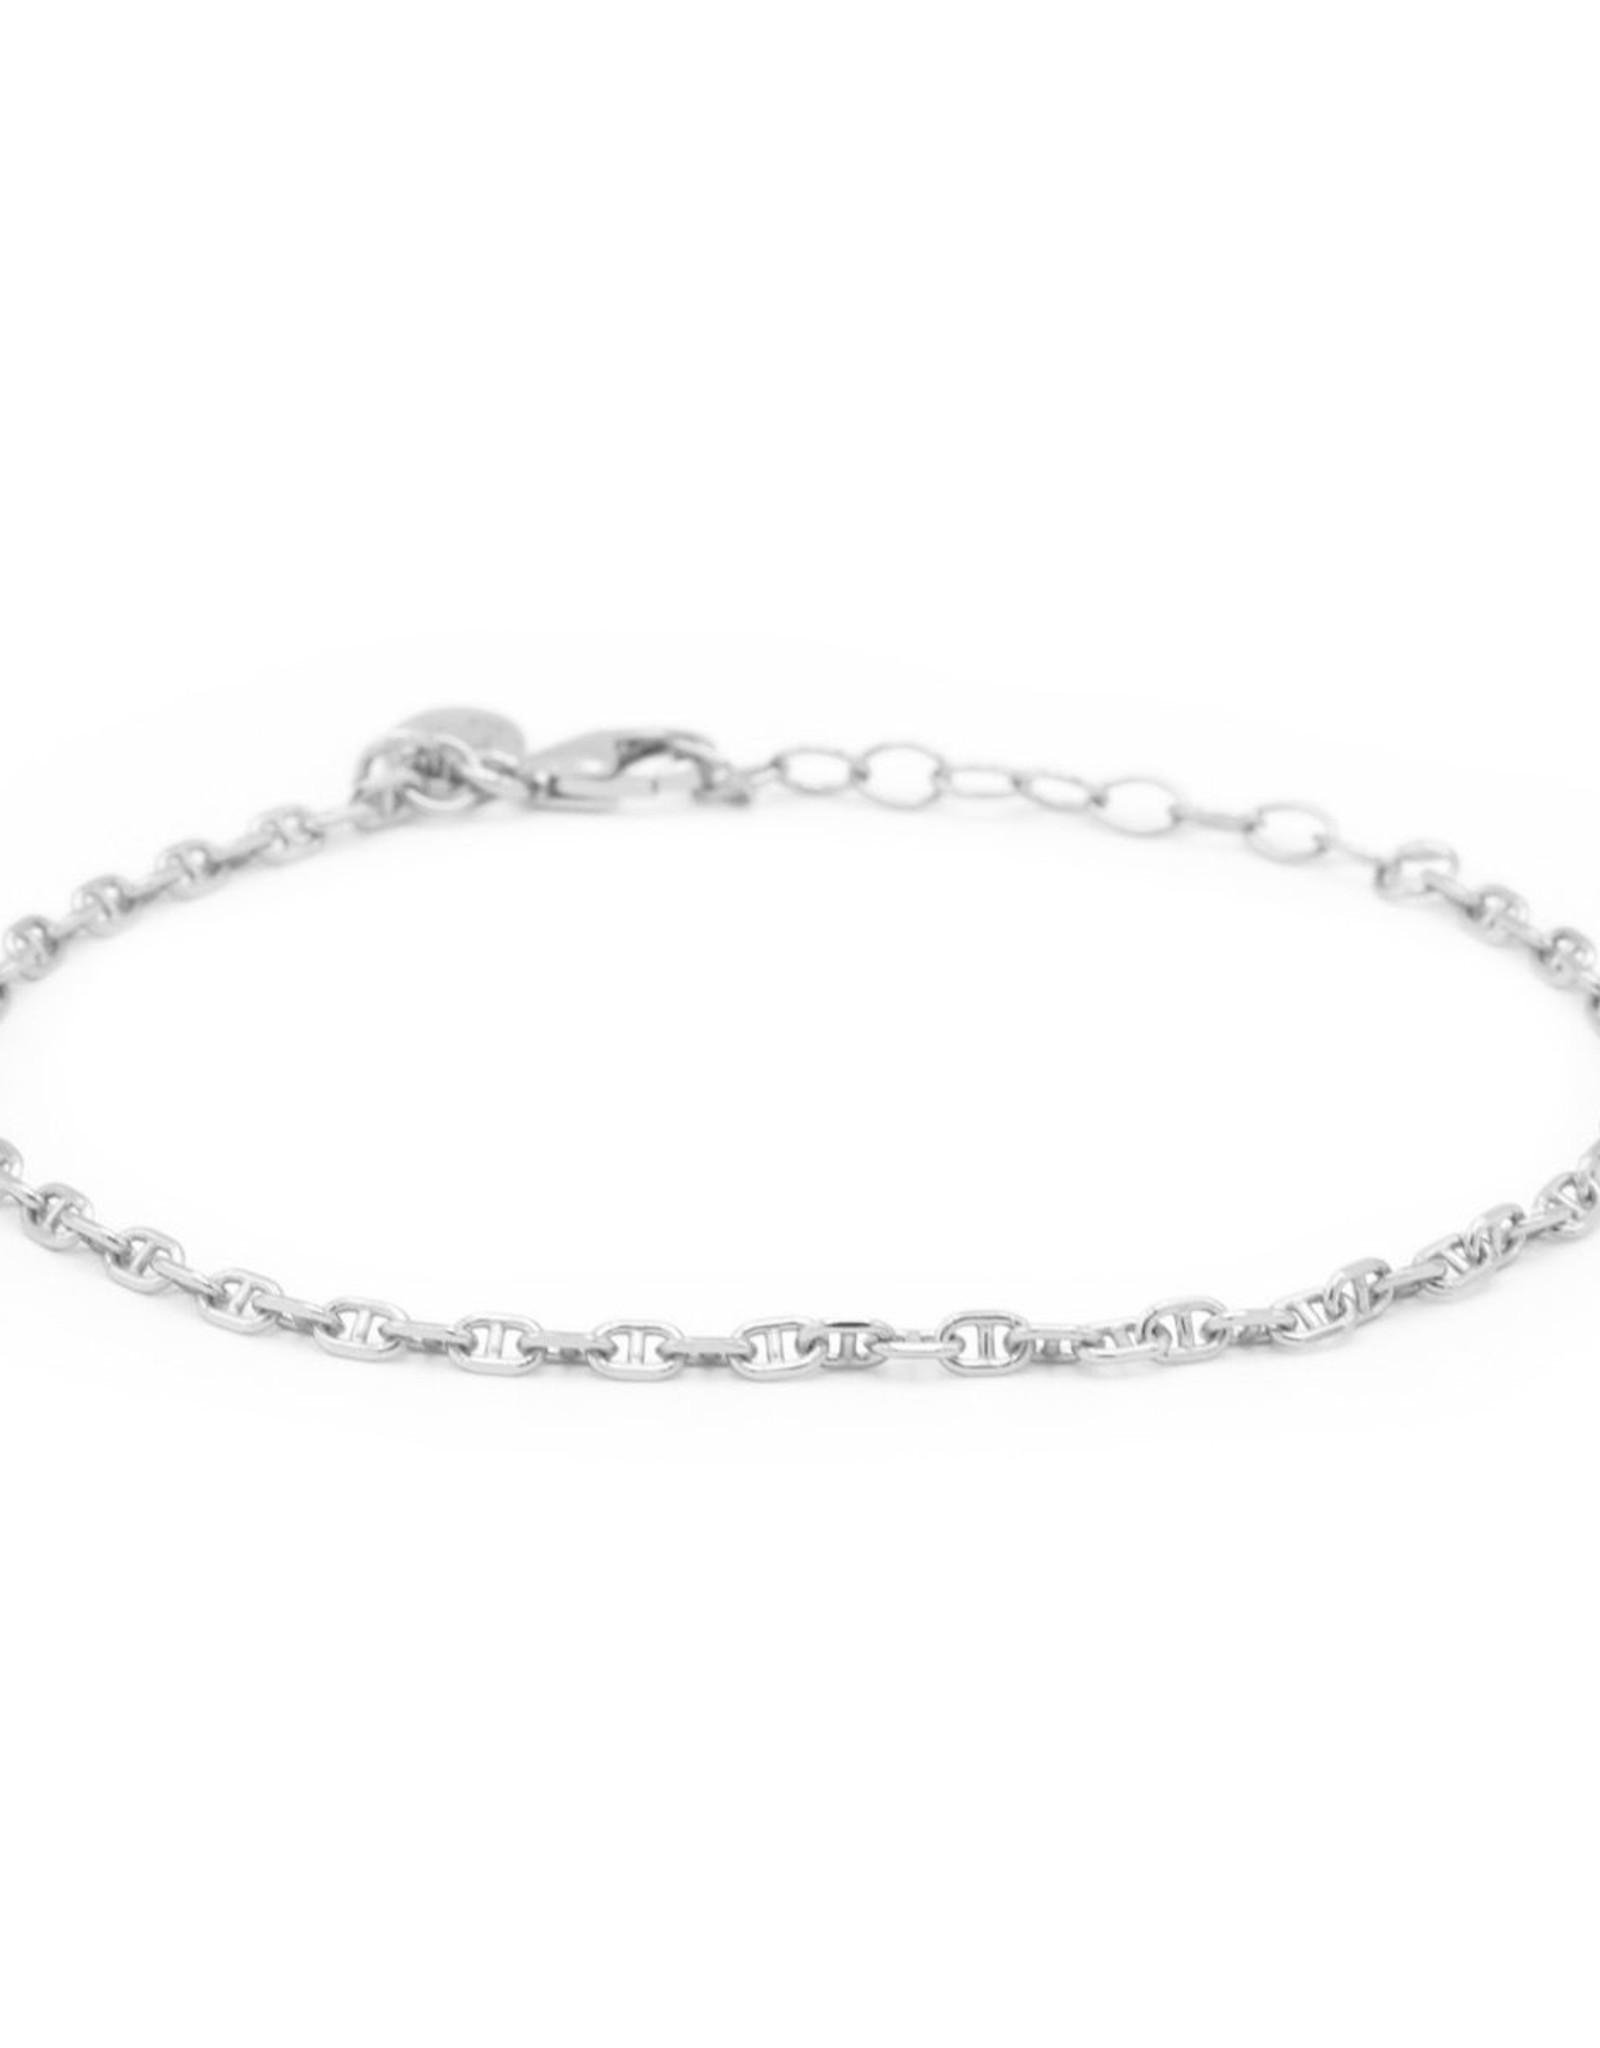 Karma Bracelet Queens Chain Silver